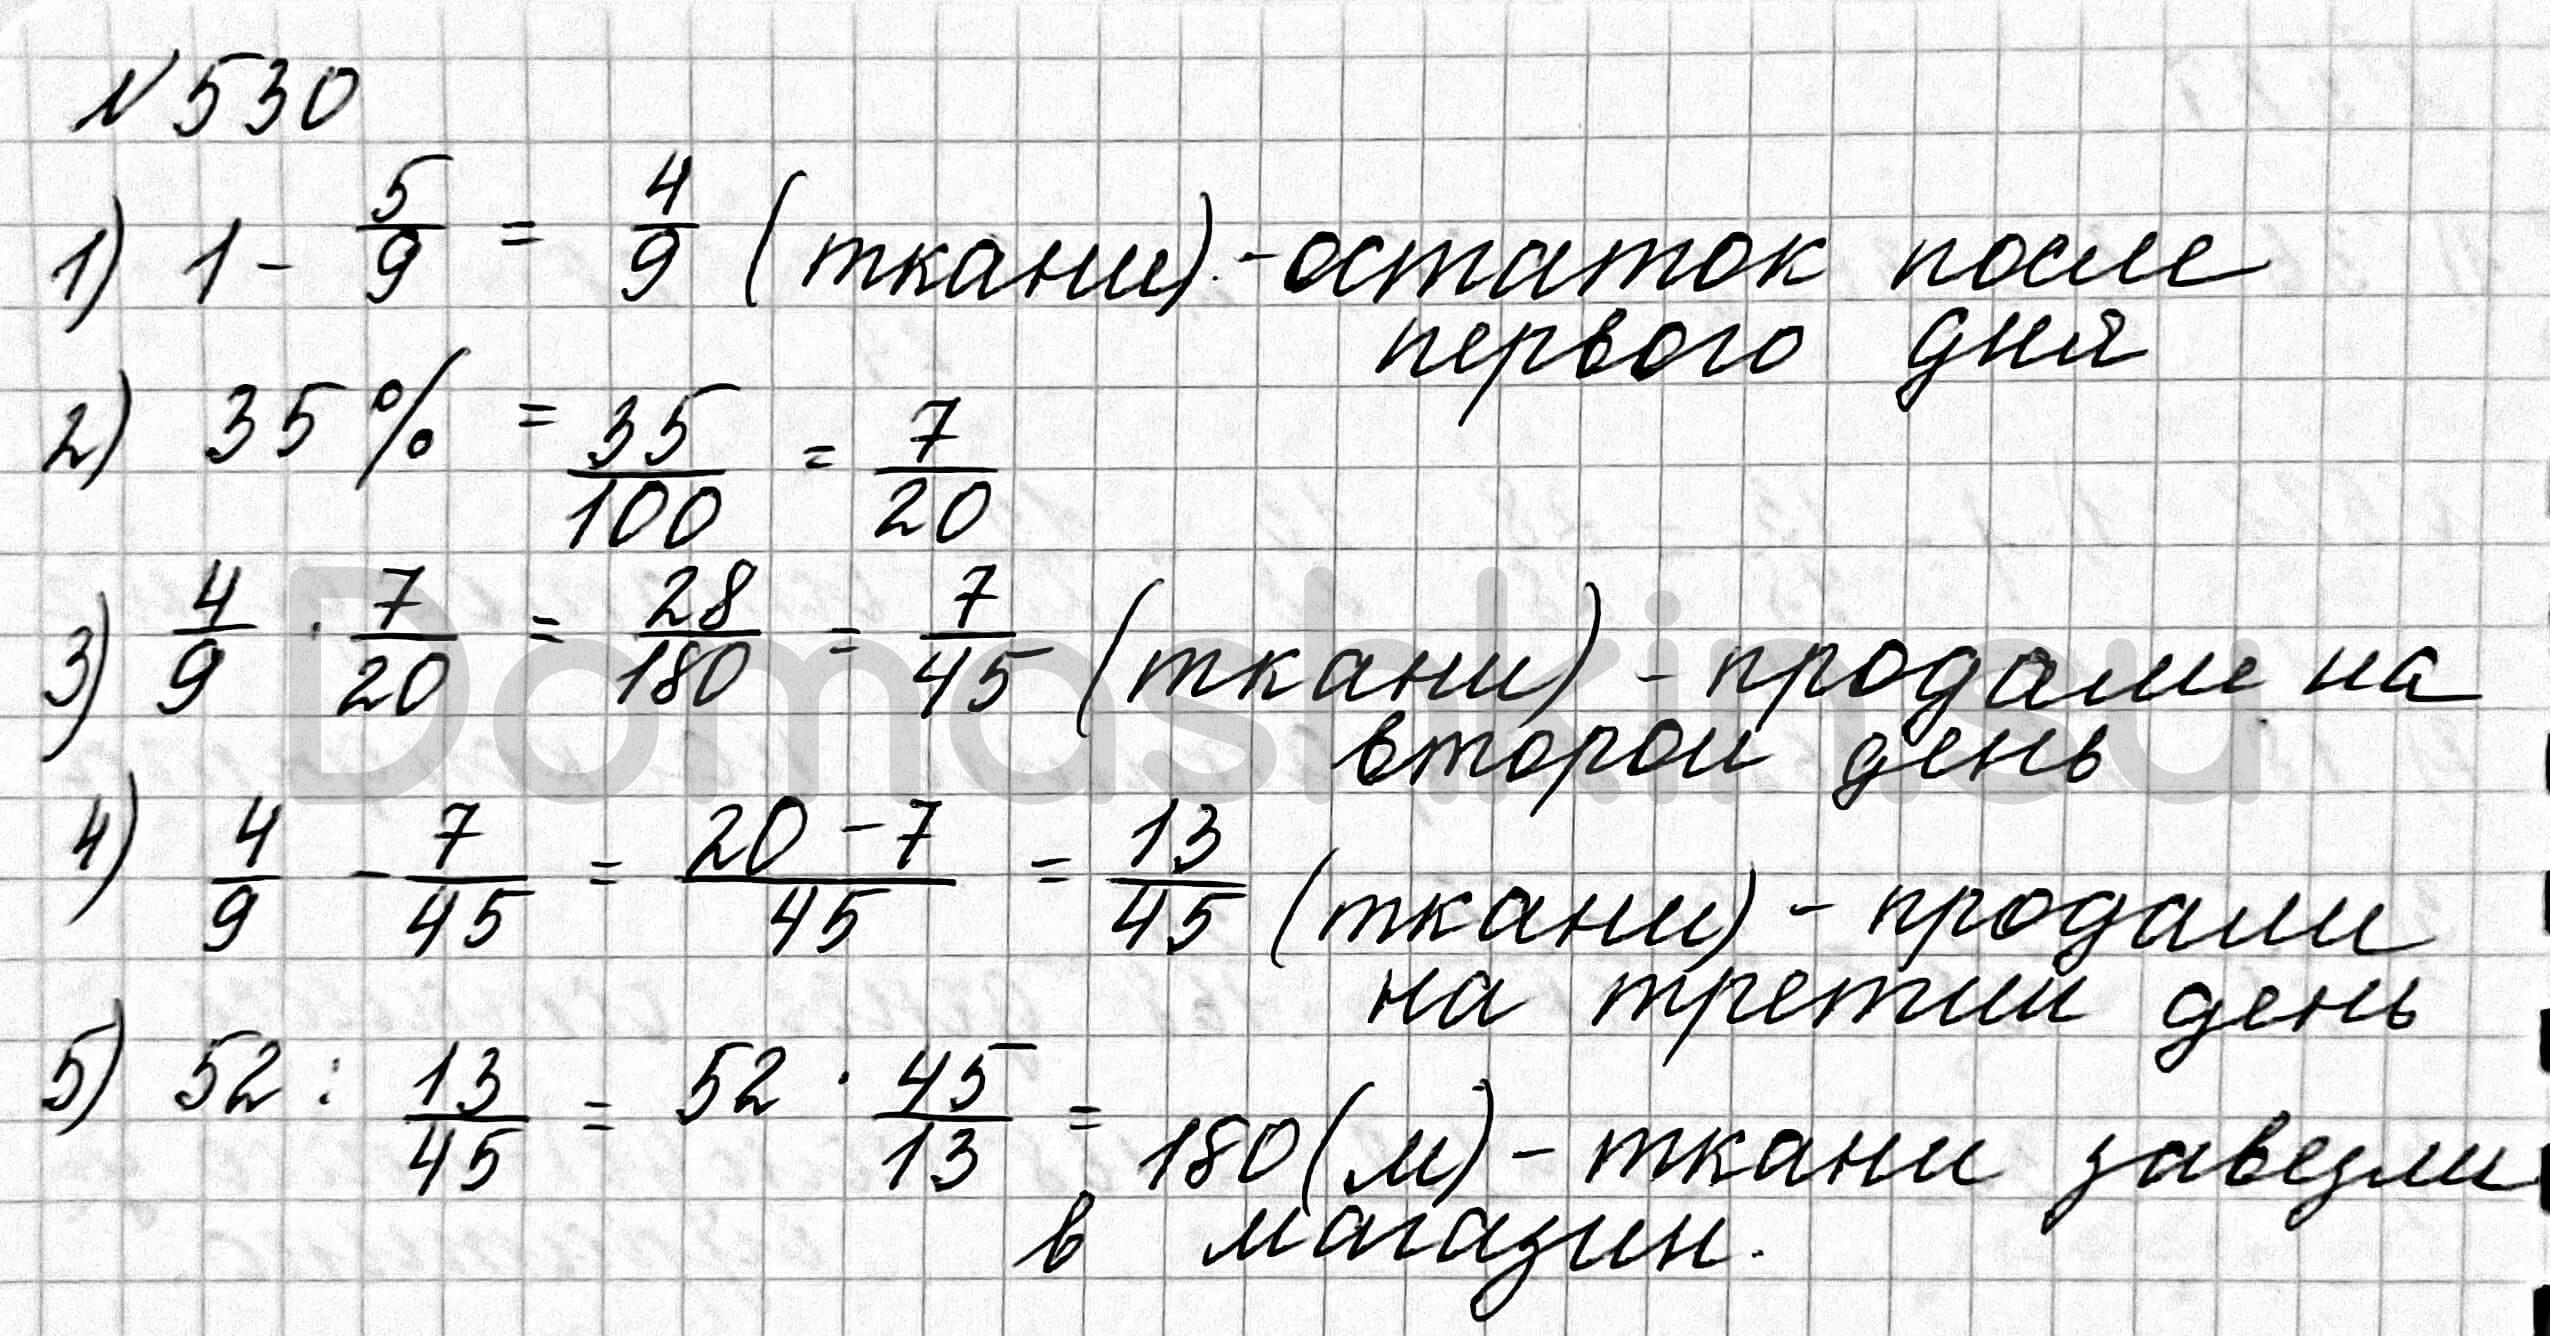 Математика 6 класс учебник Мерзляк номер 530 решение